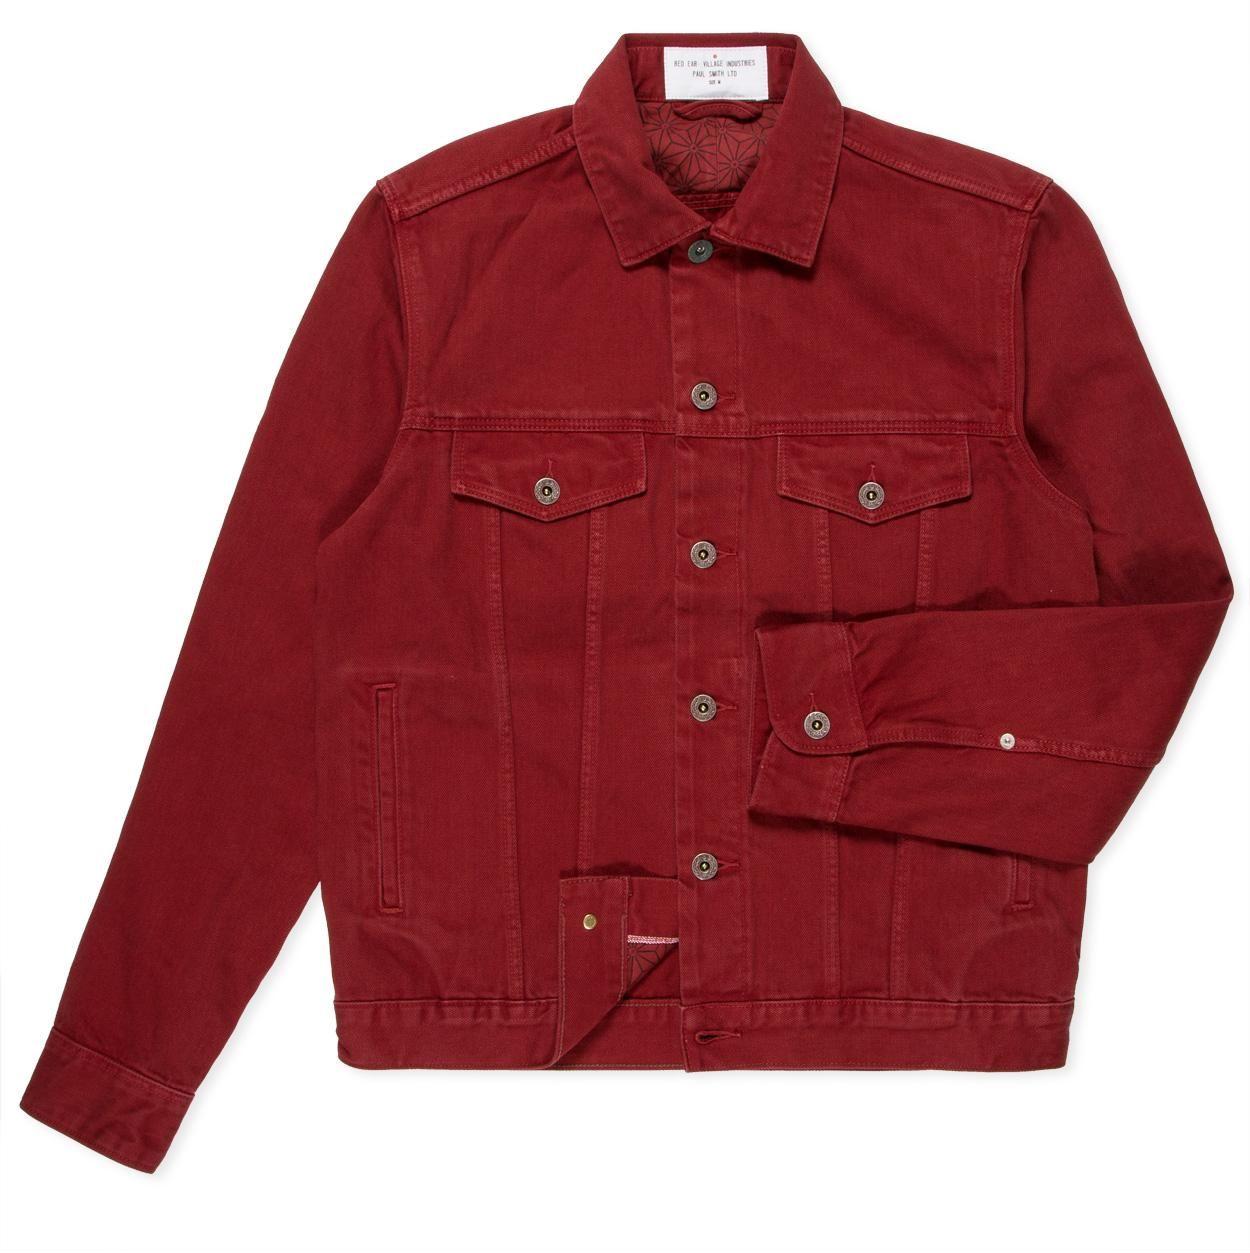 Paul Smith Men's Jackets | Red Selvedge Slub Denim Jacket | Must ...